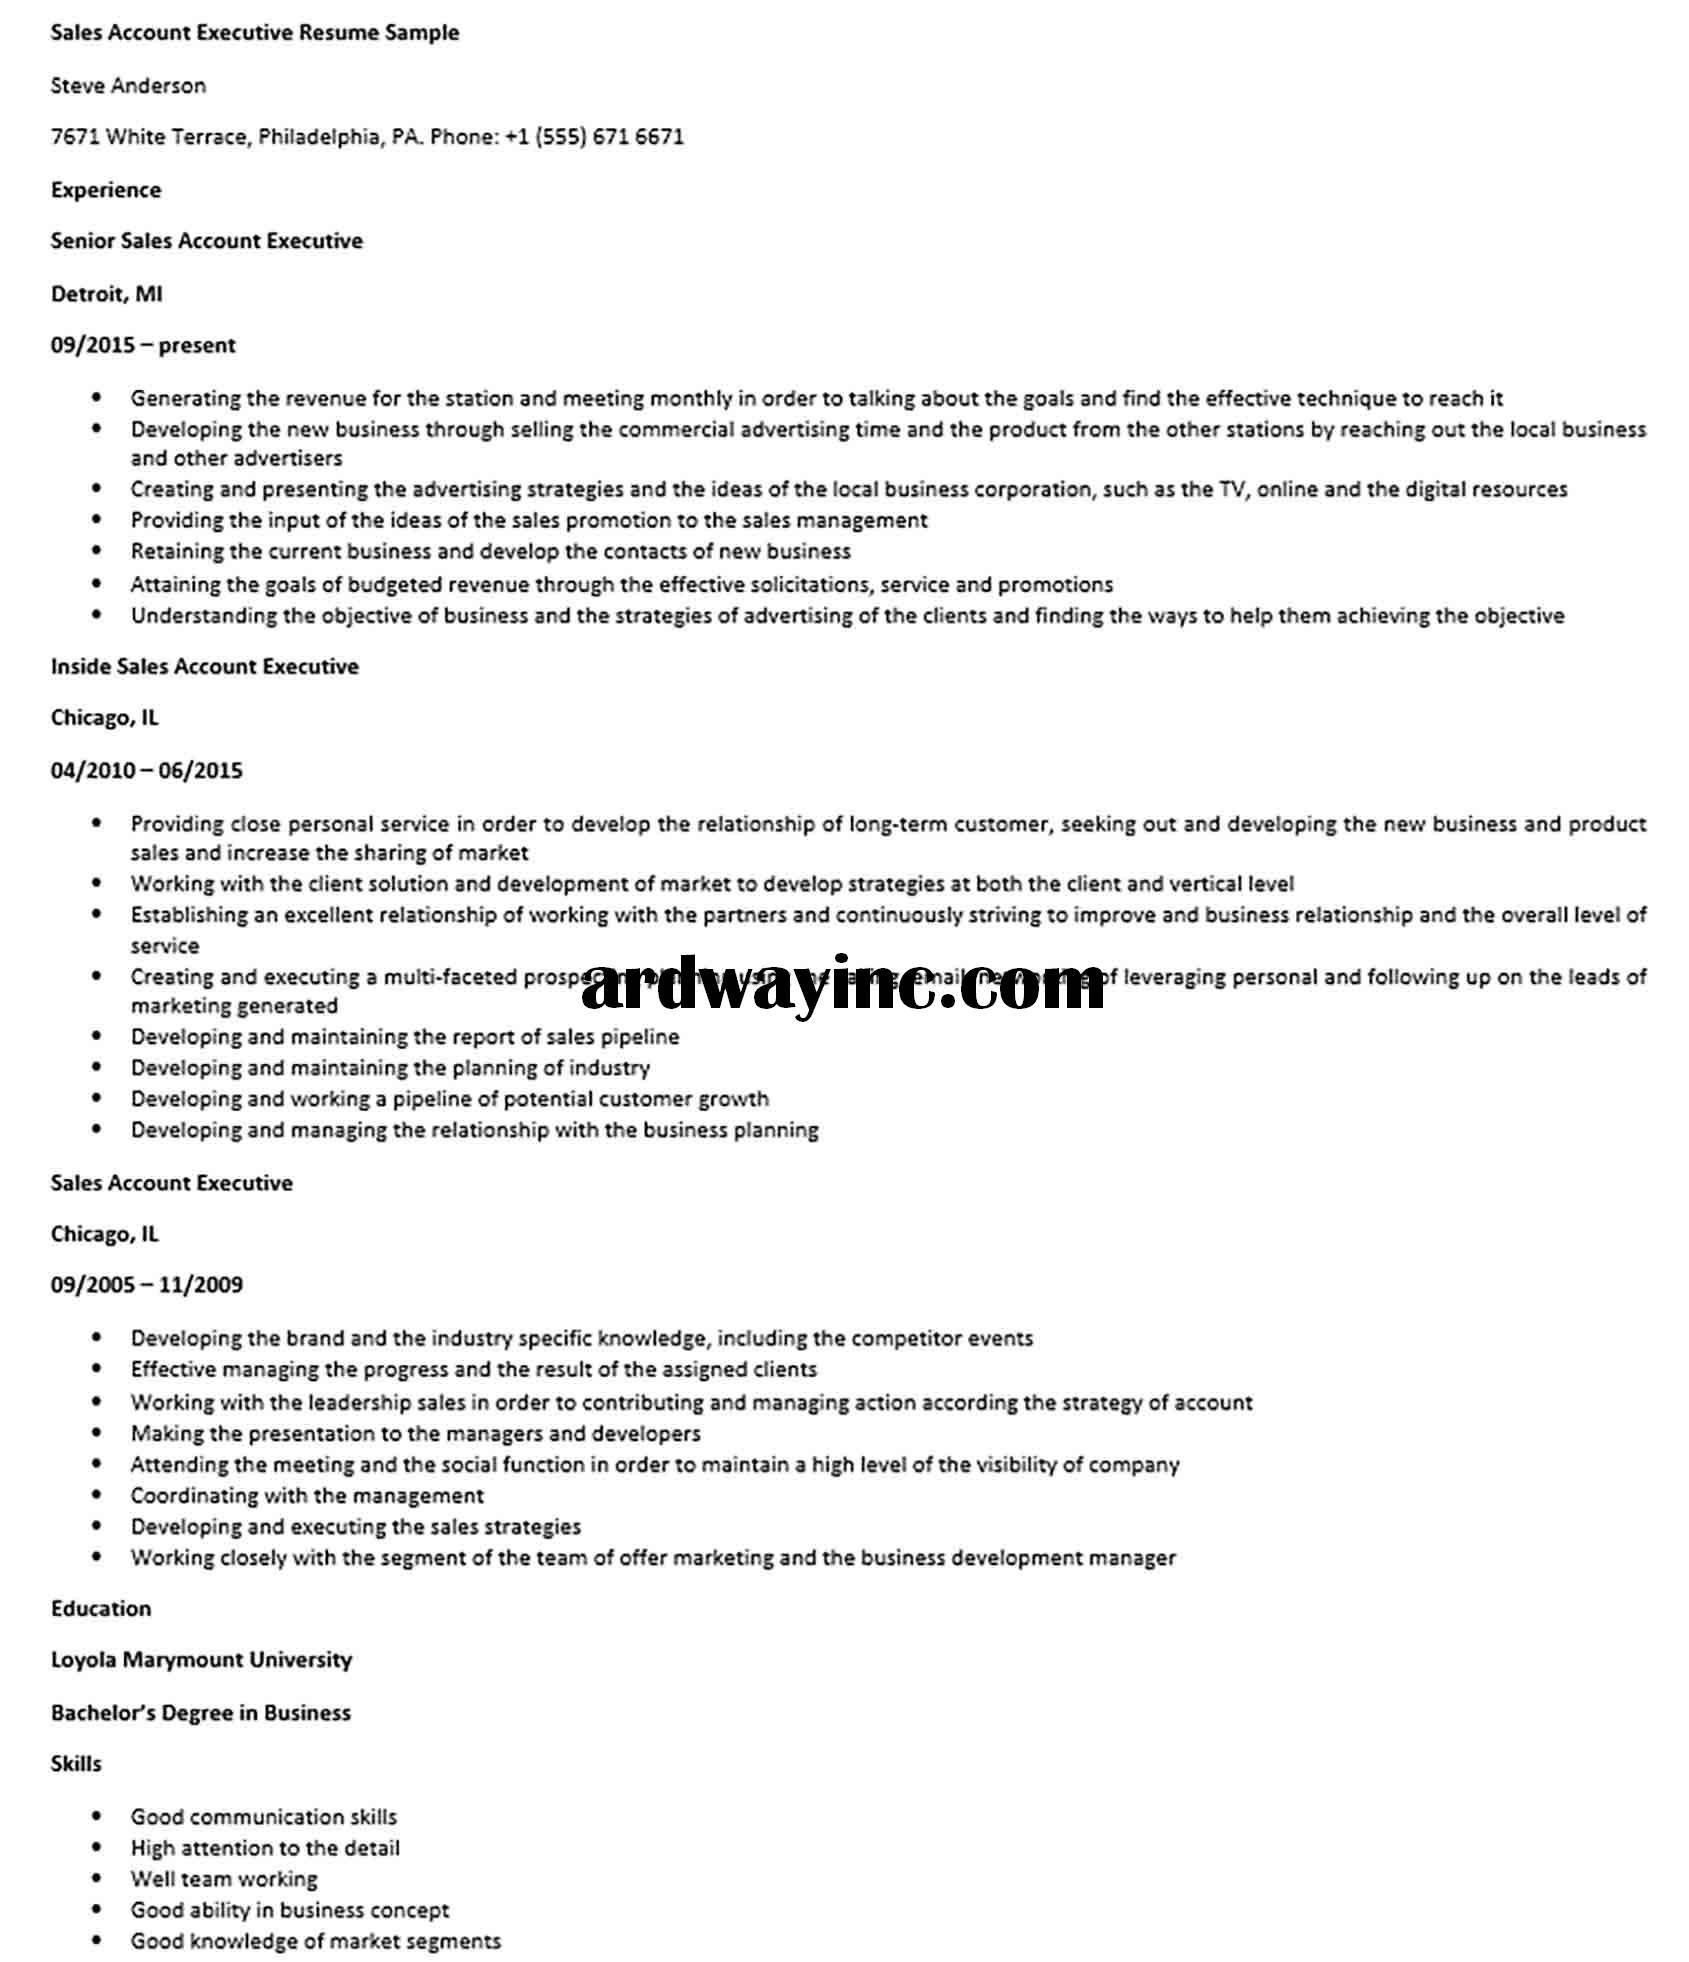 Sales Account Executive Resume Sample Executive Resume Account Executive Resume